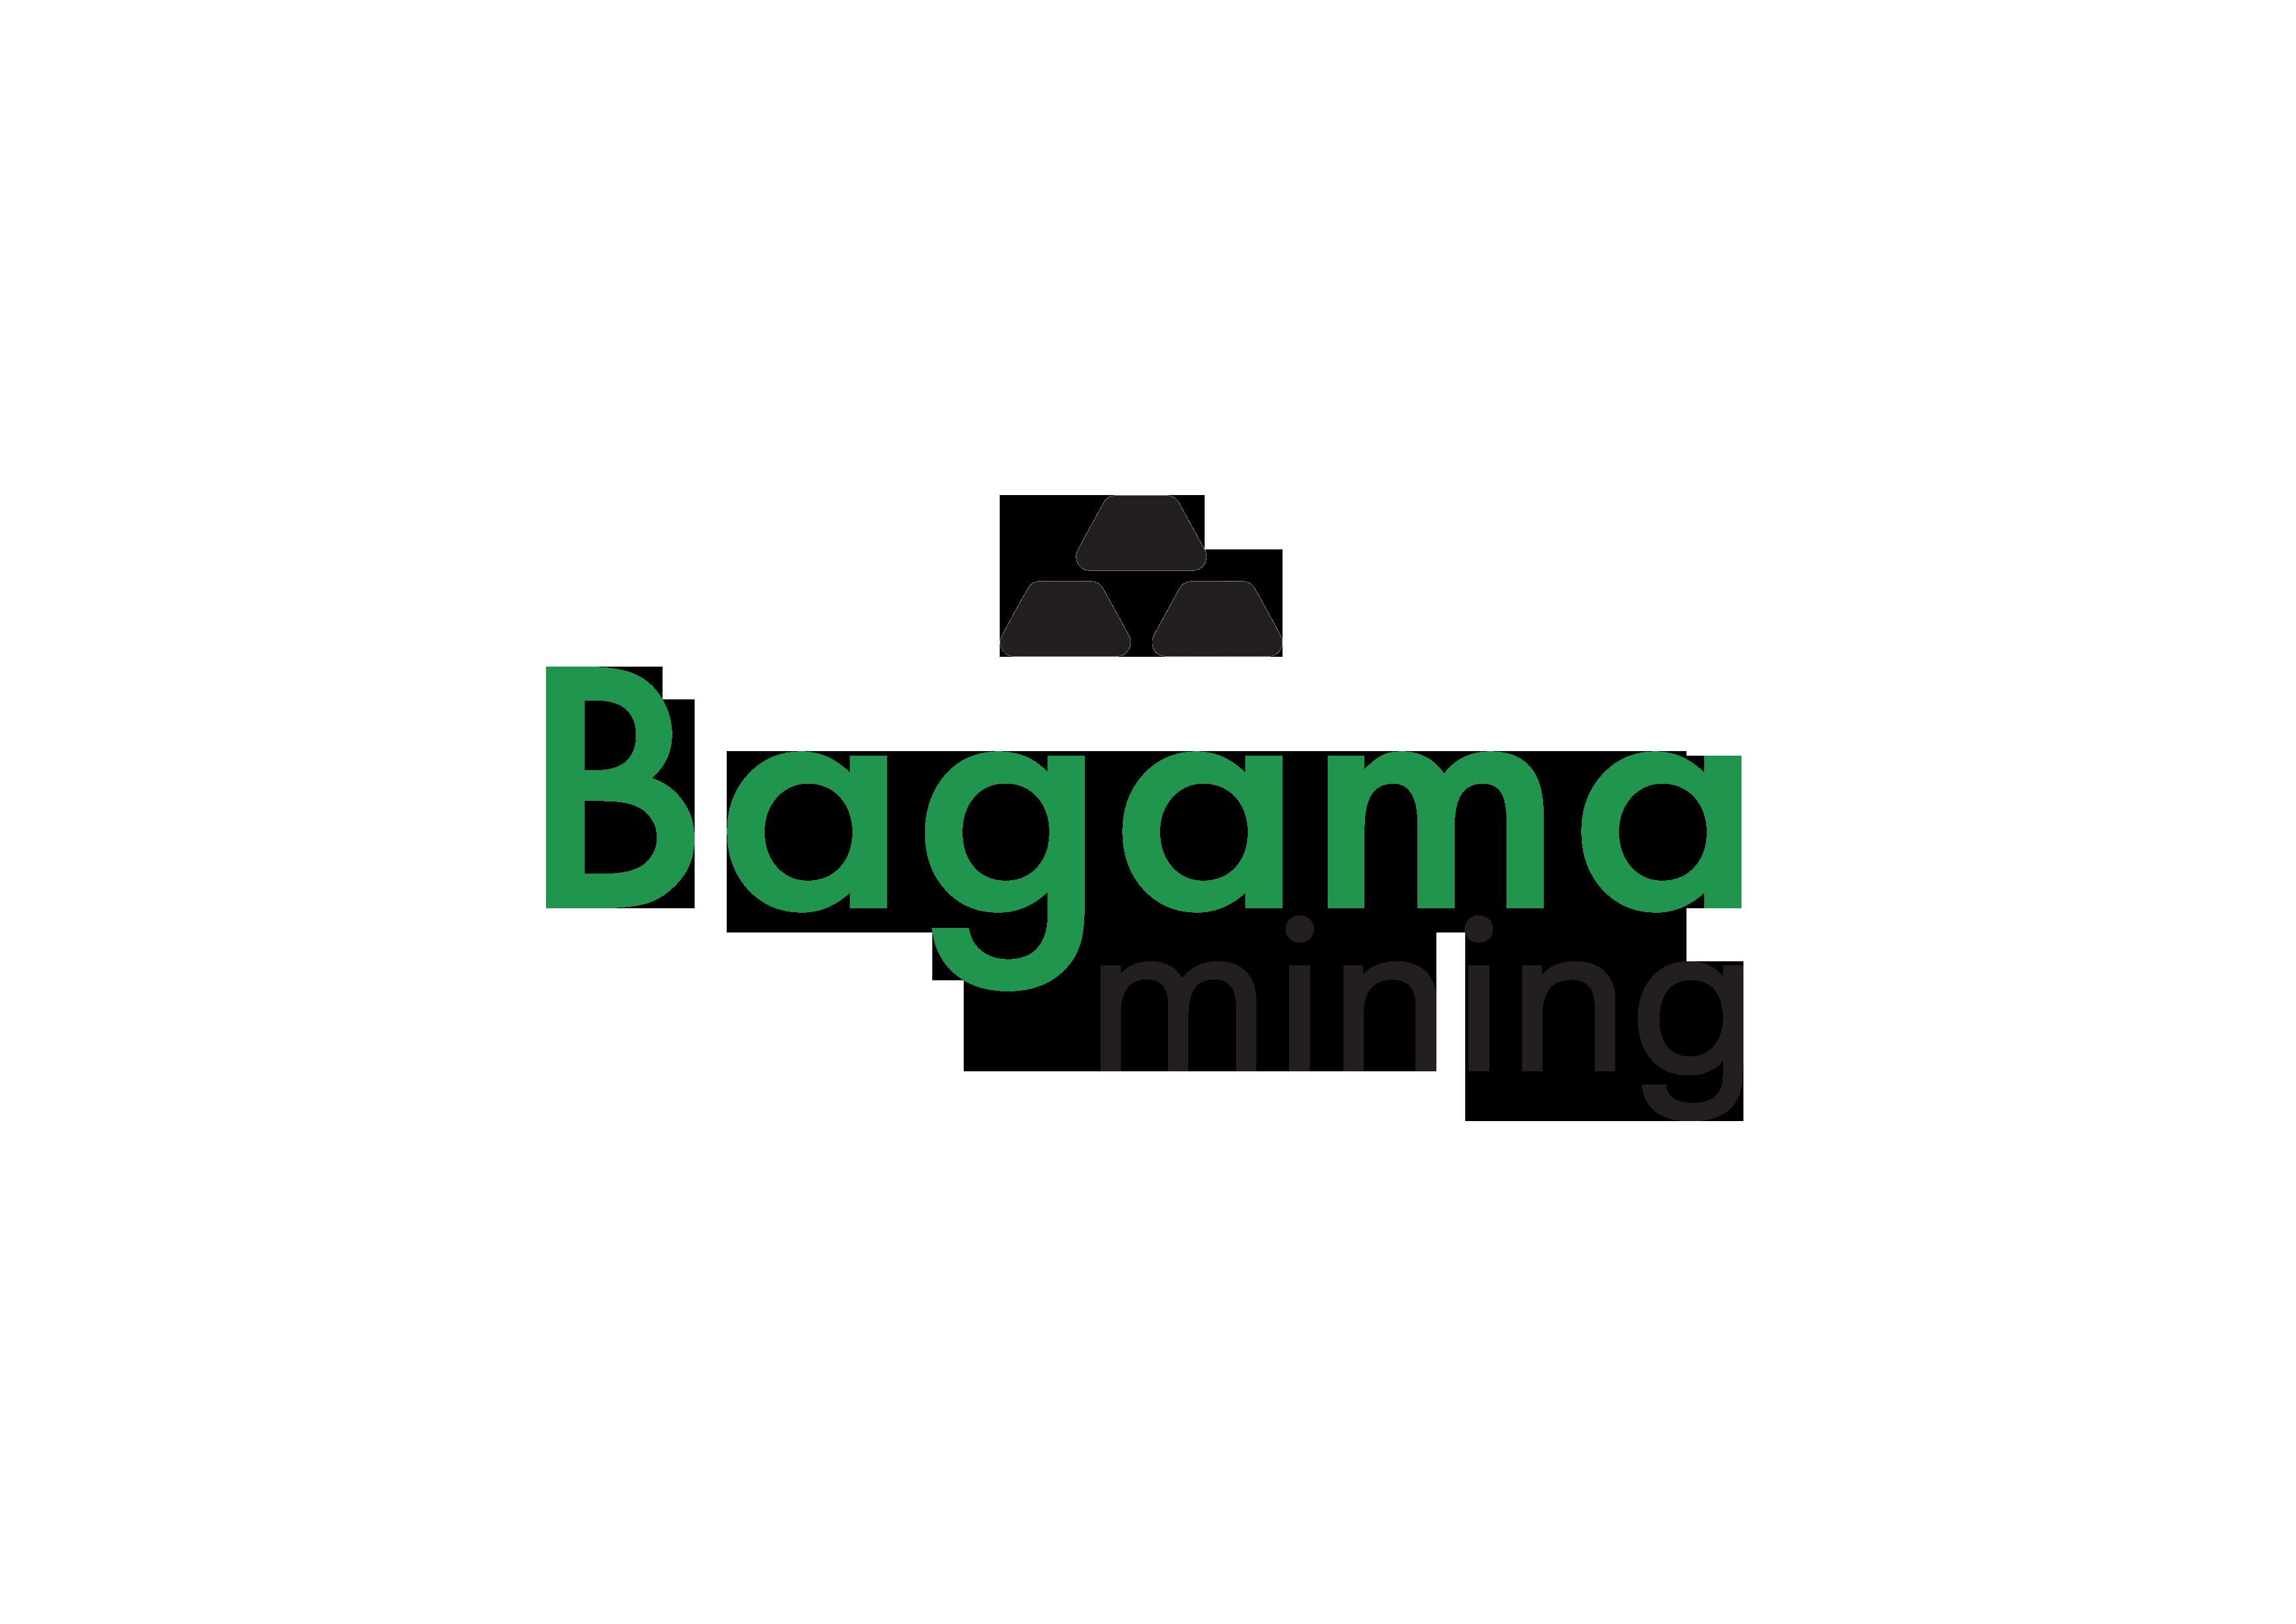 Bagama